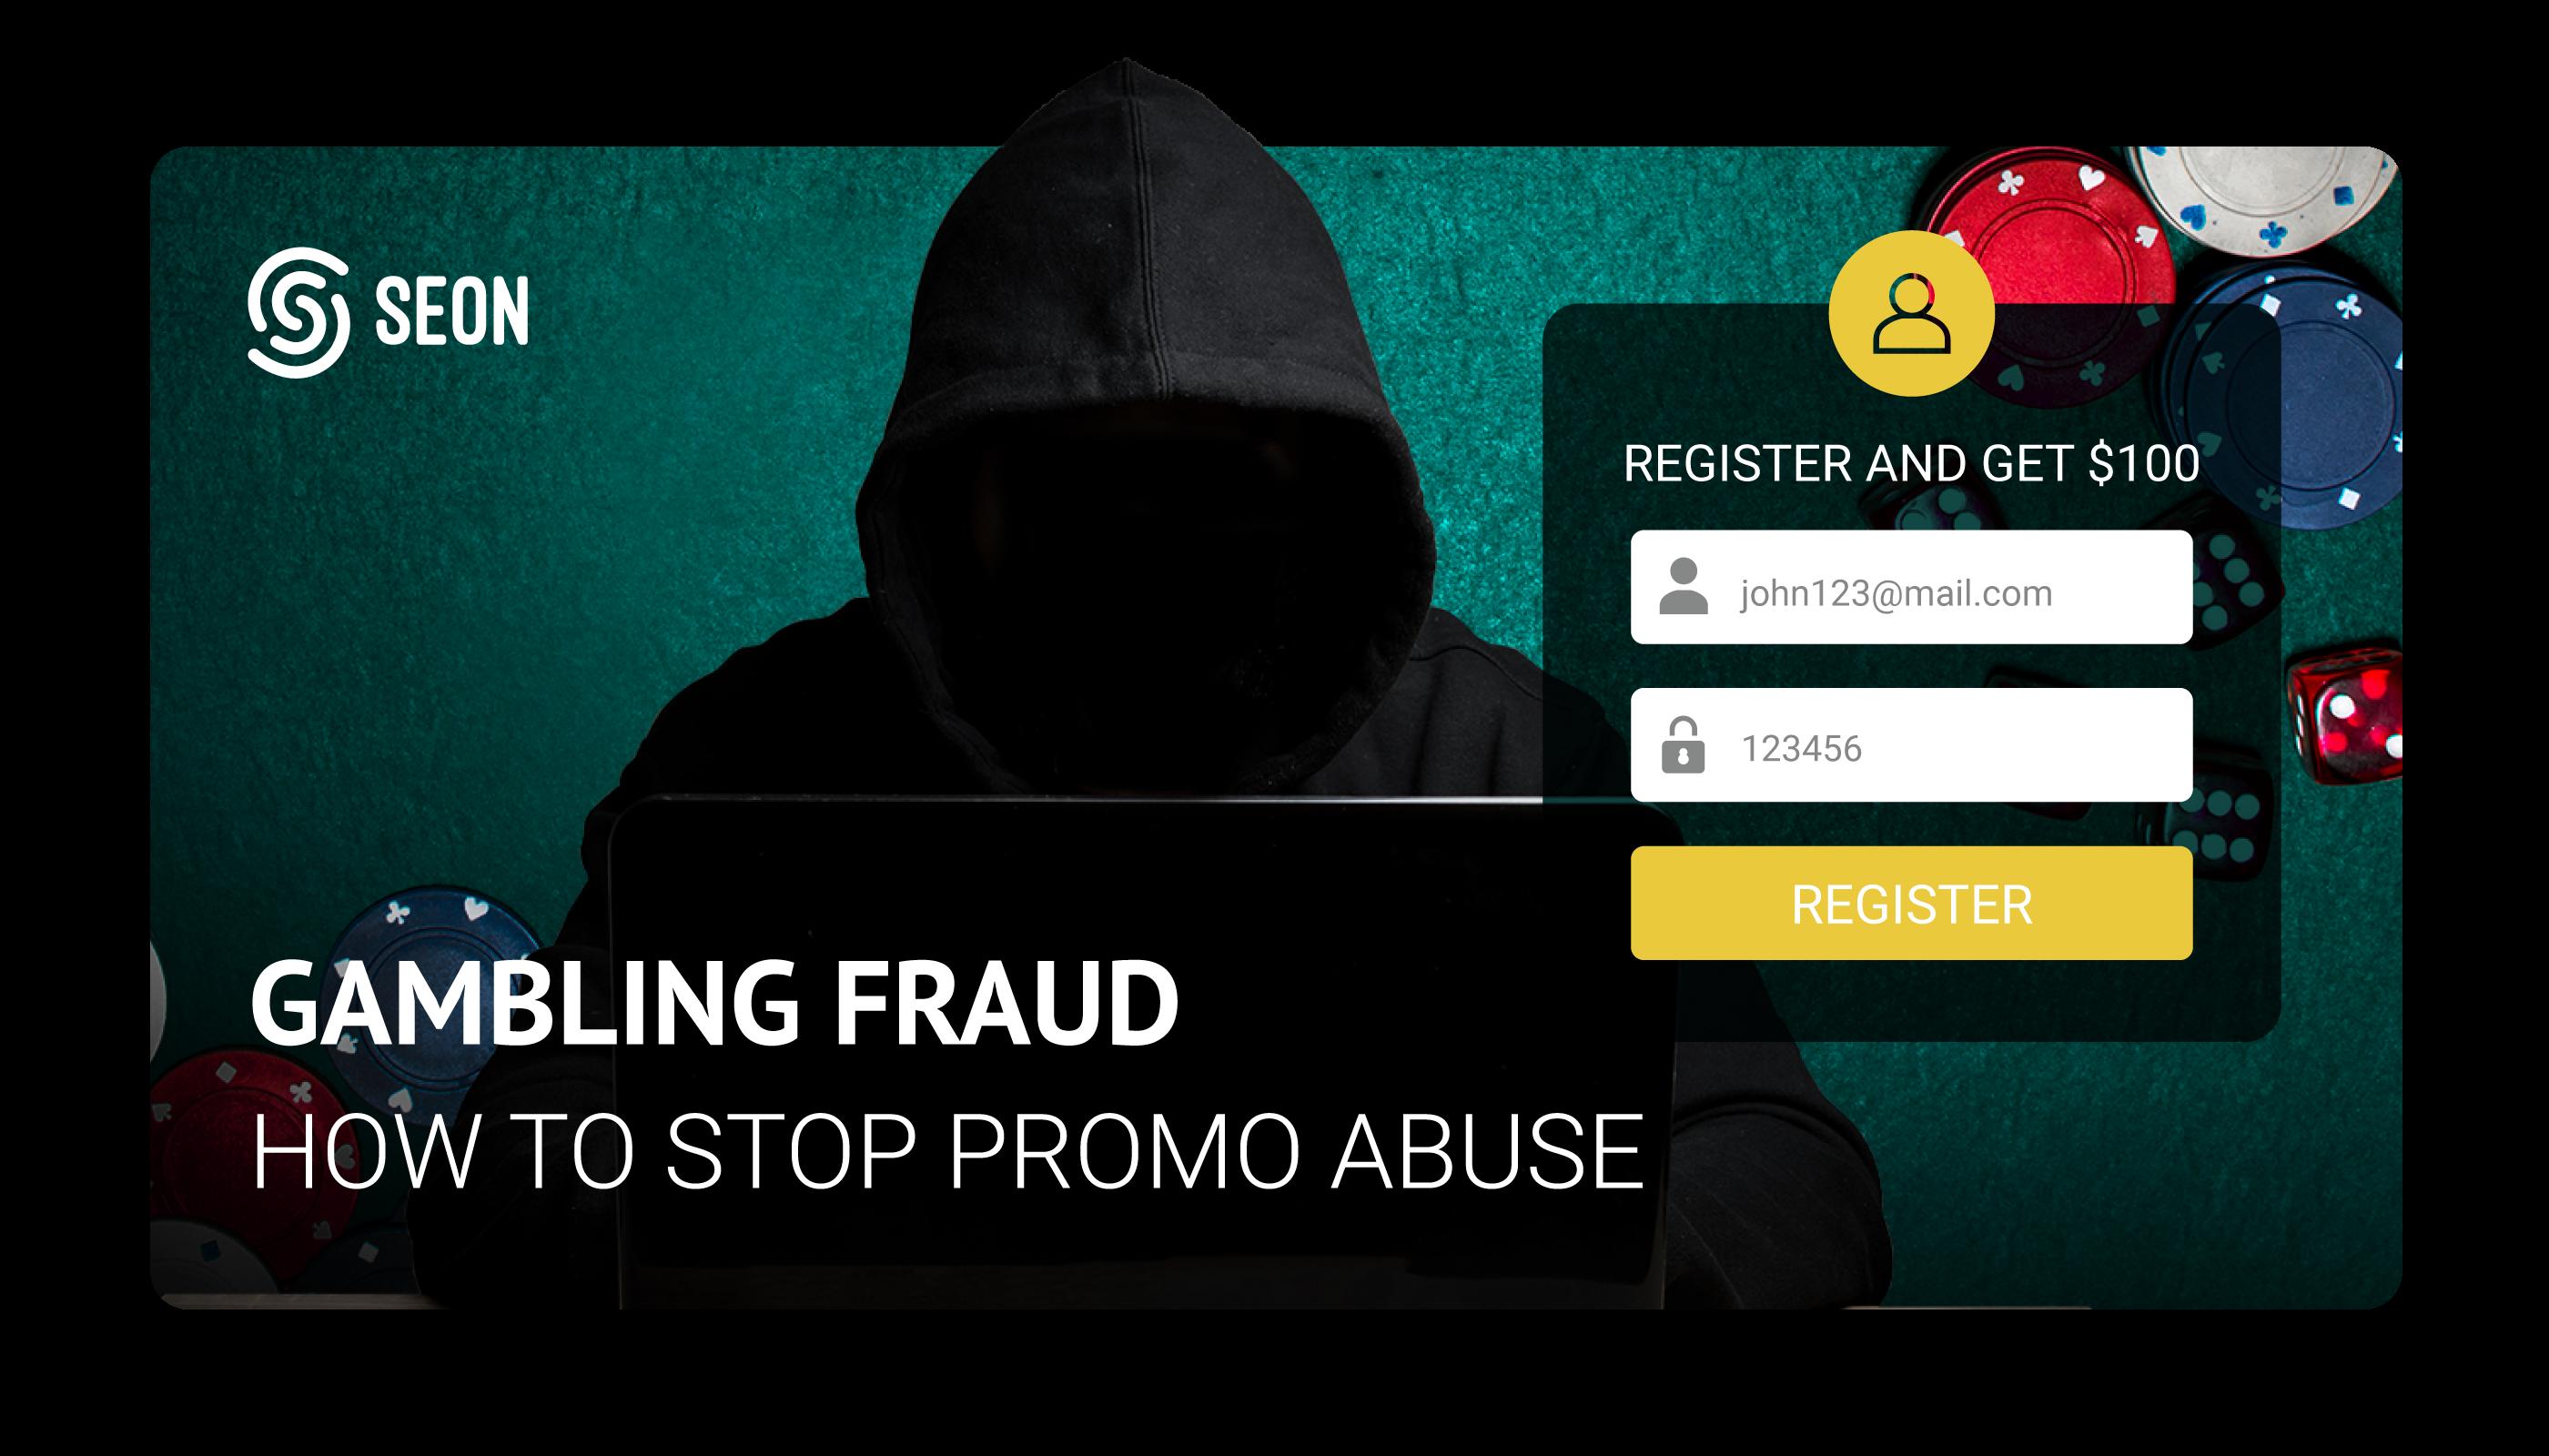 gambling-fraud-promo-abuse